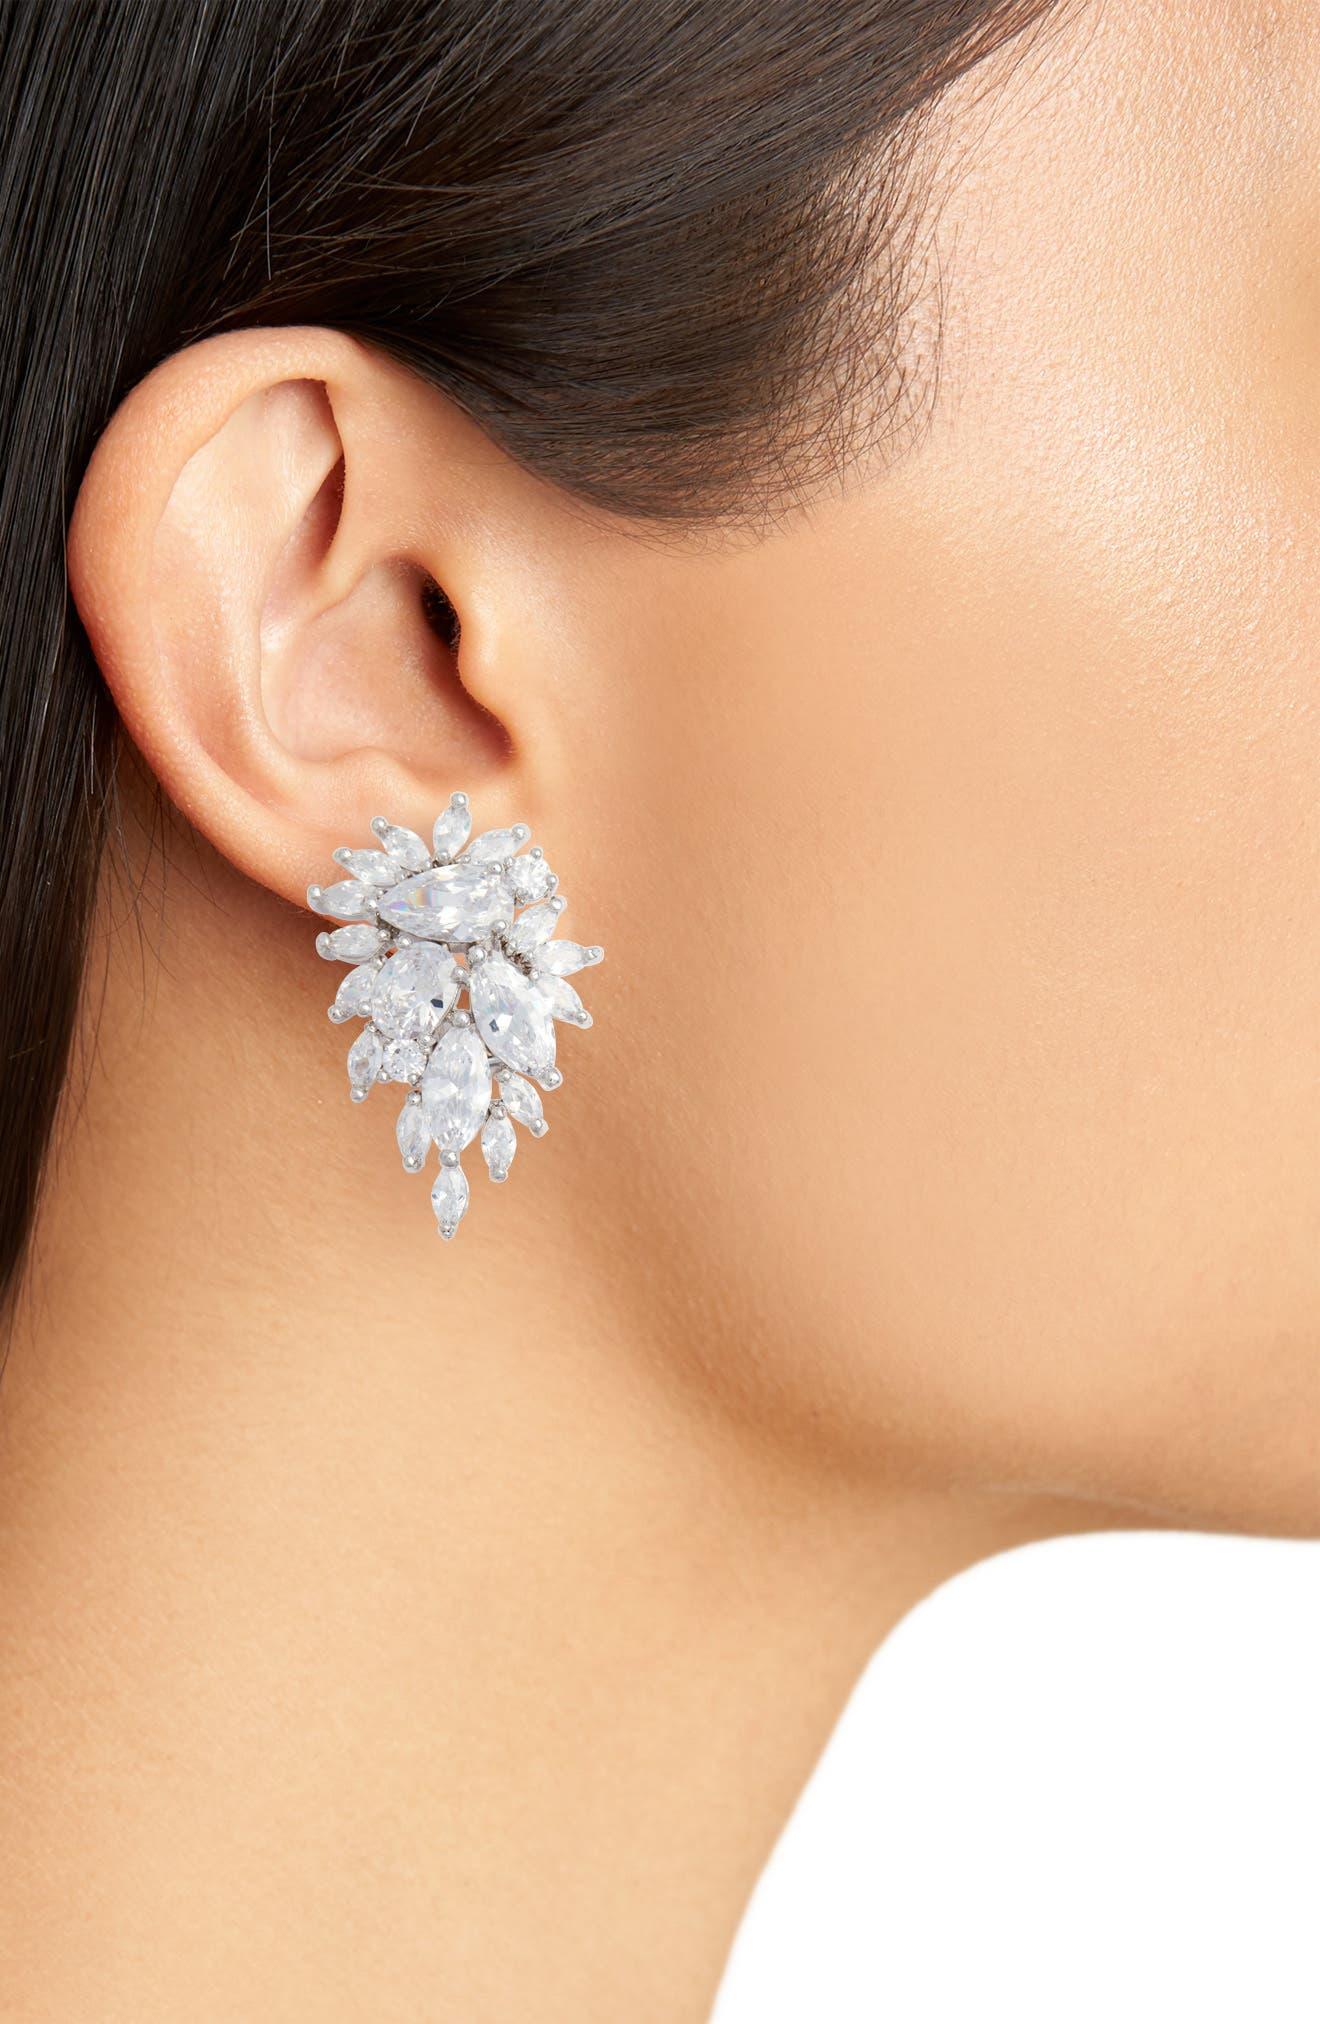 Cluster Omega Clip Earrings,                             Alternate thumbnail 2, color,                             Silver/ White Cz